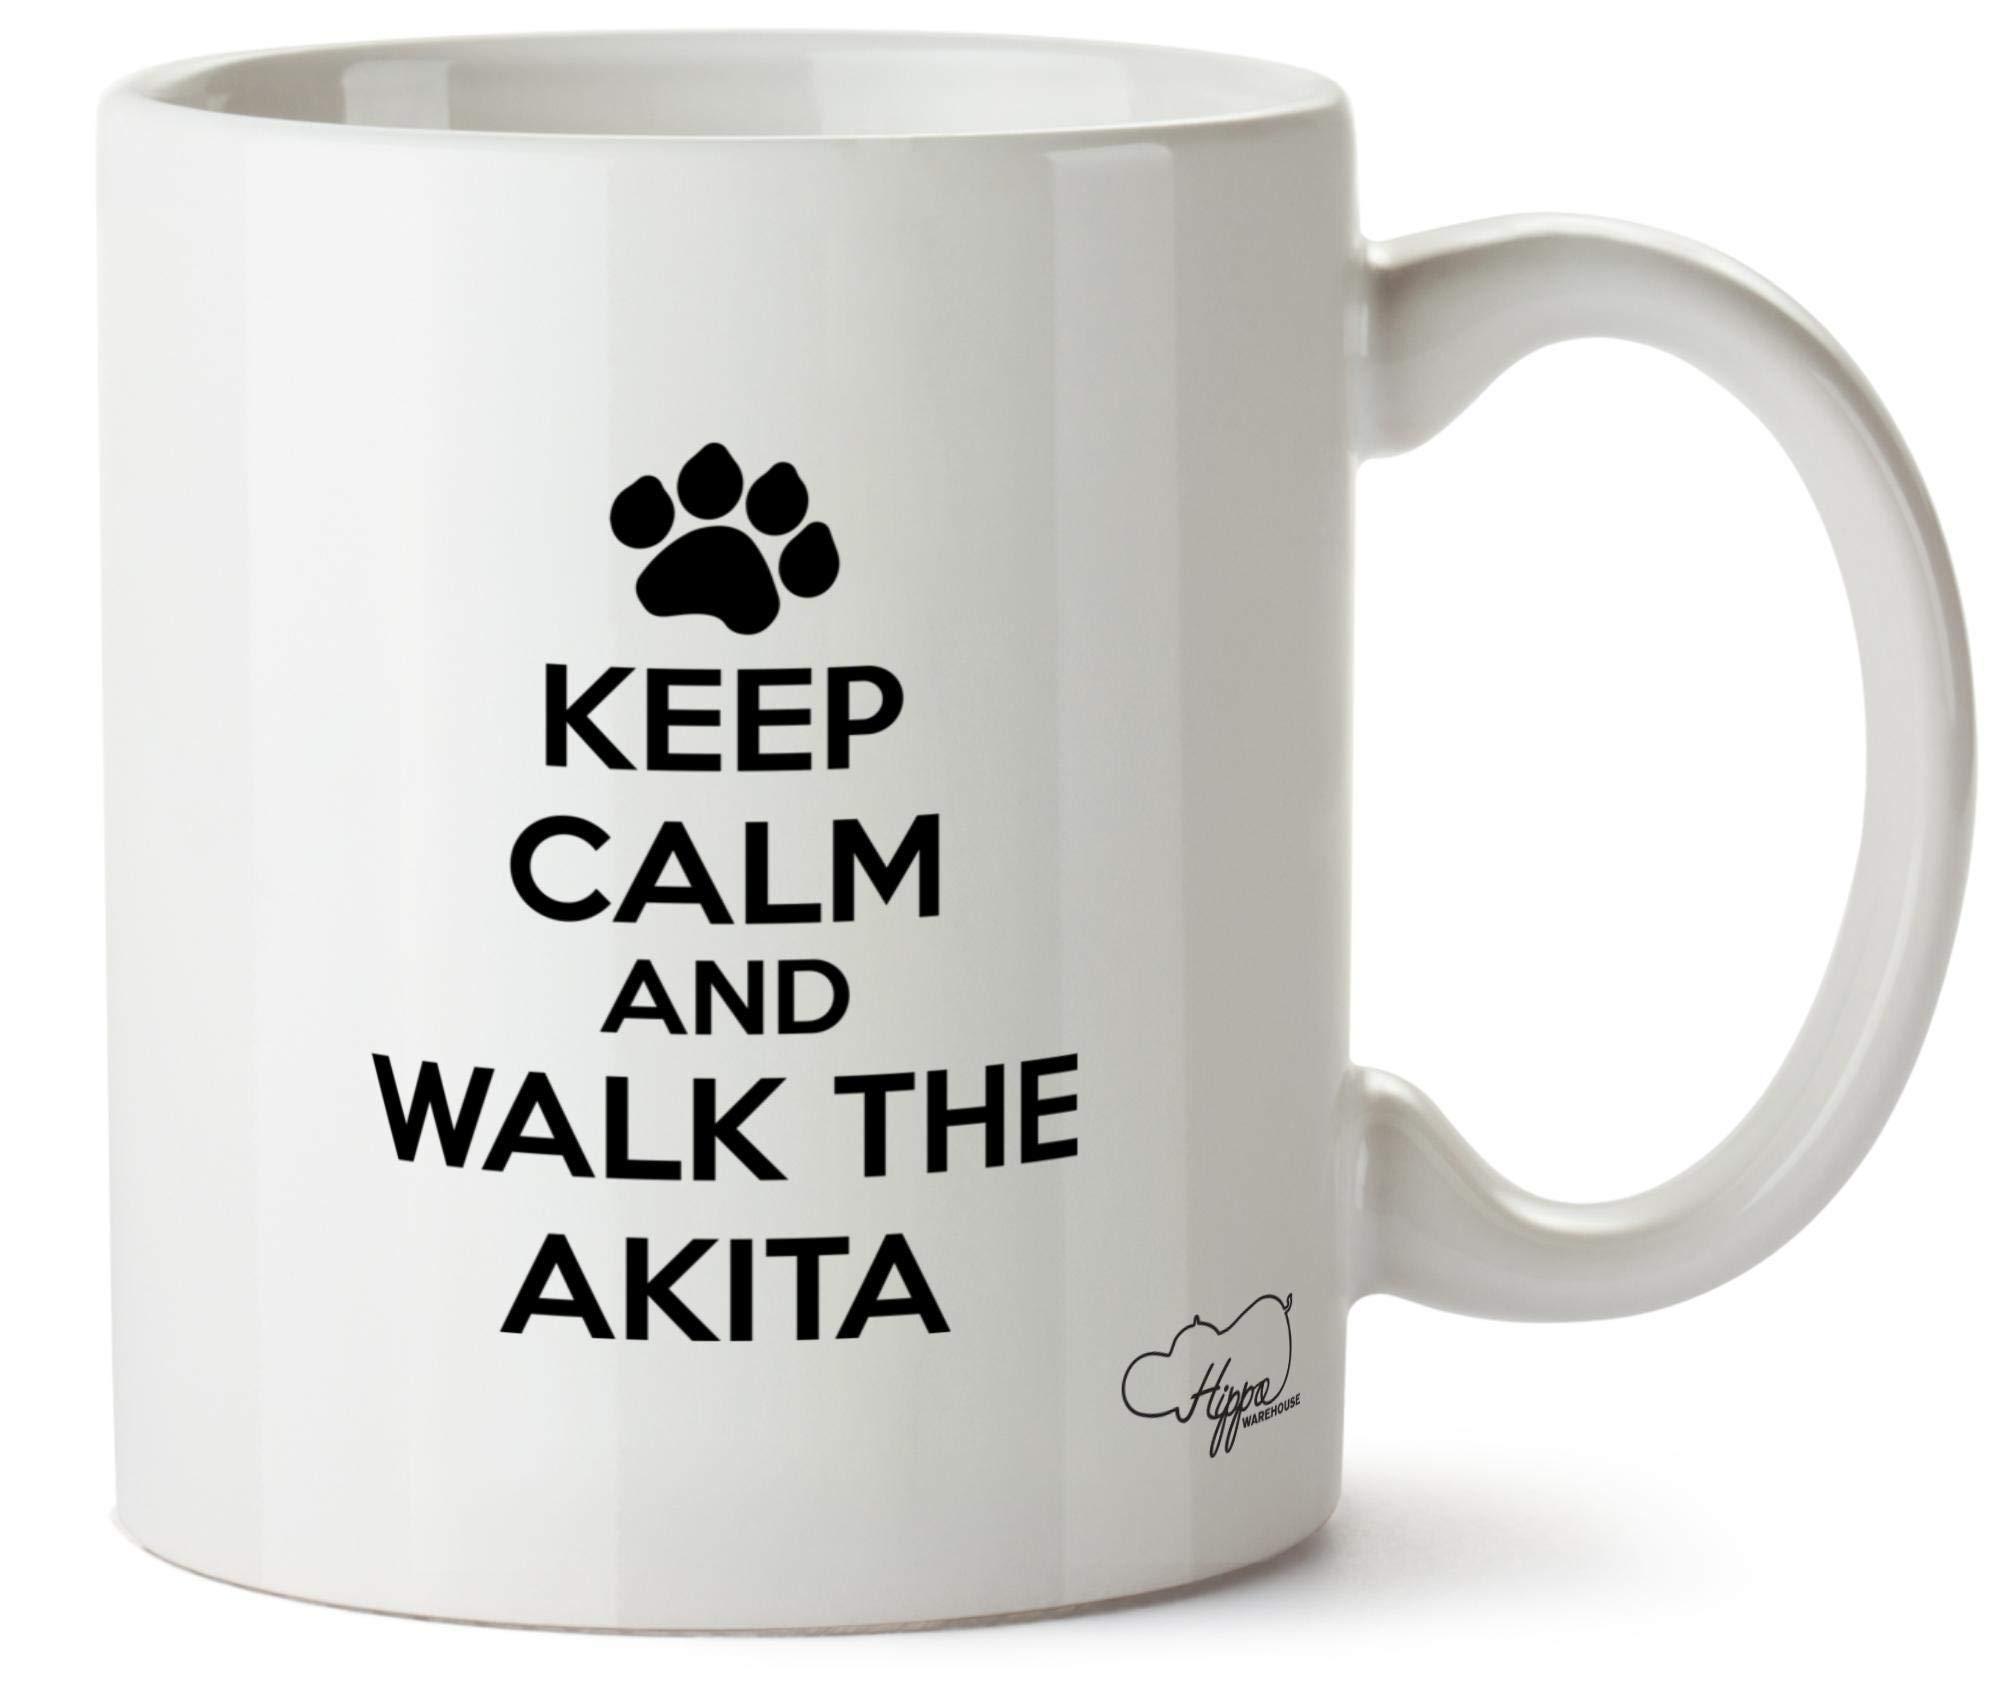 Hippowarehouse Keep Calm and Walk The Akita – Dog Printed Mug Cup Ceramic 10oz